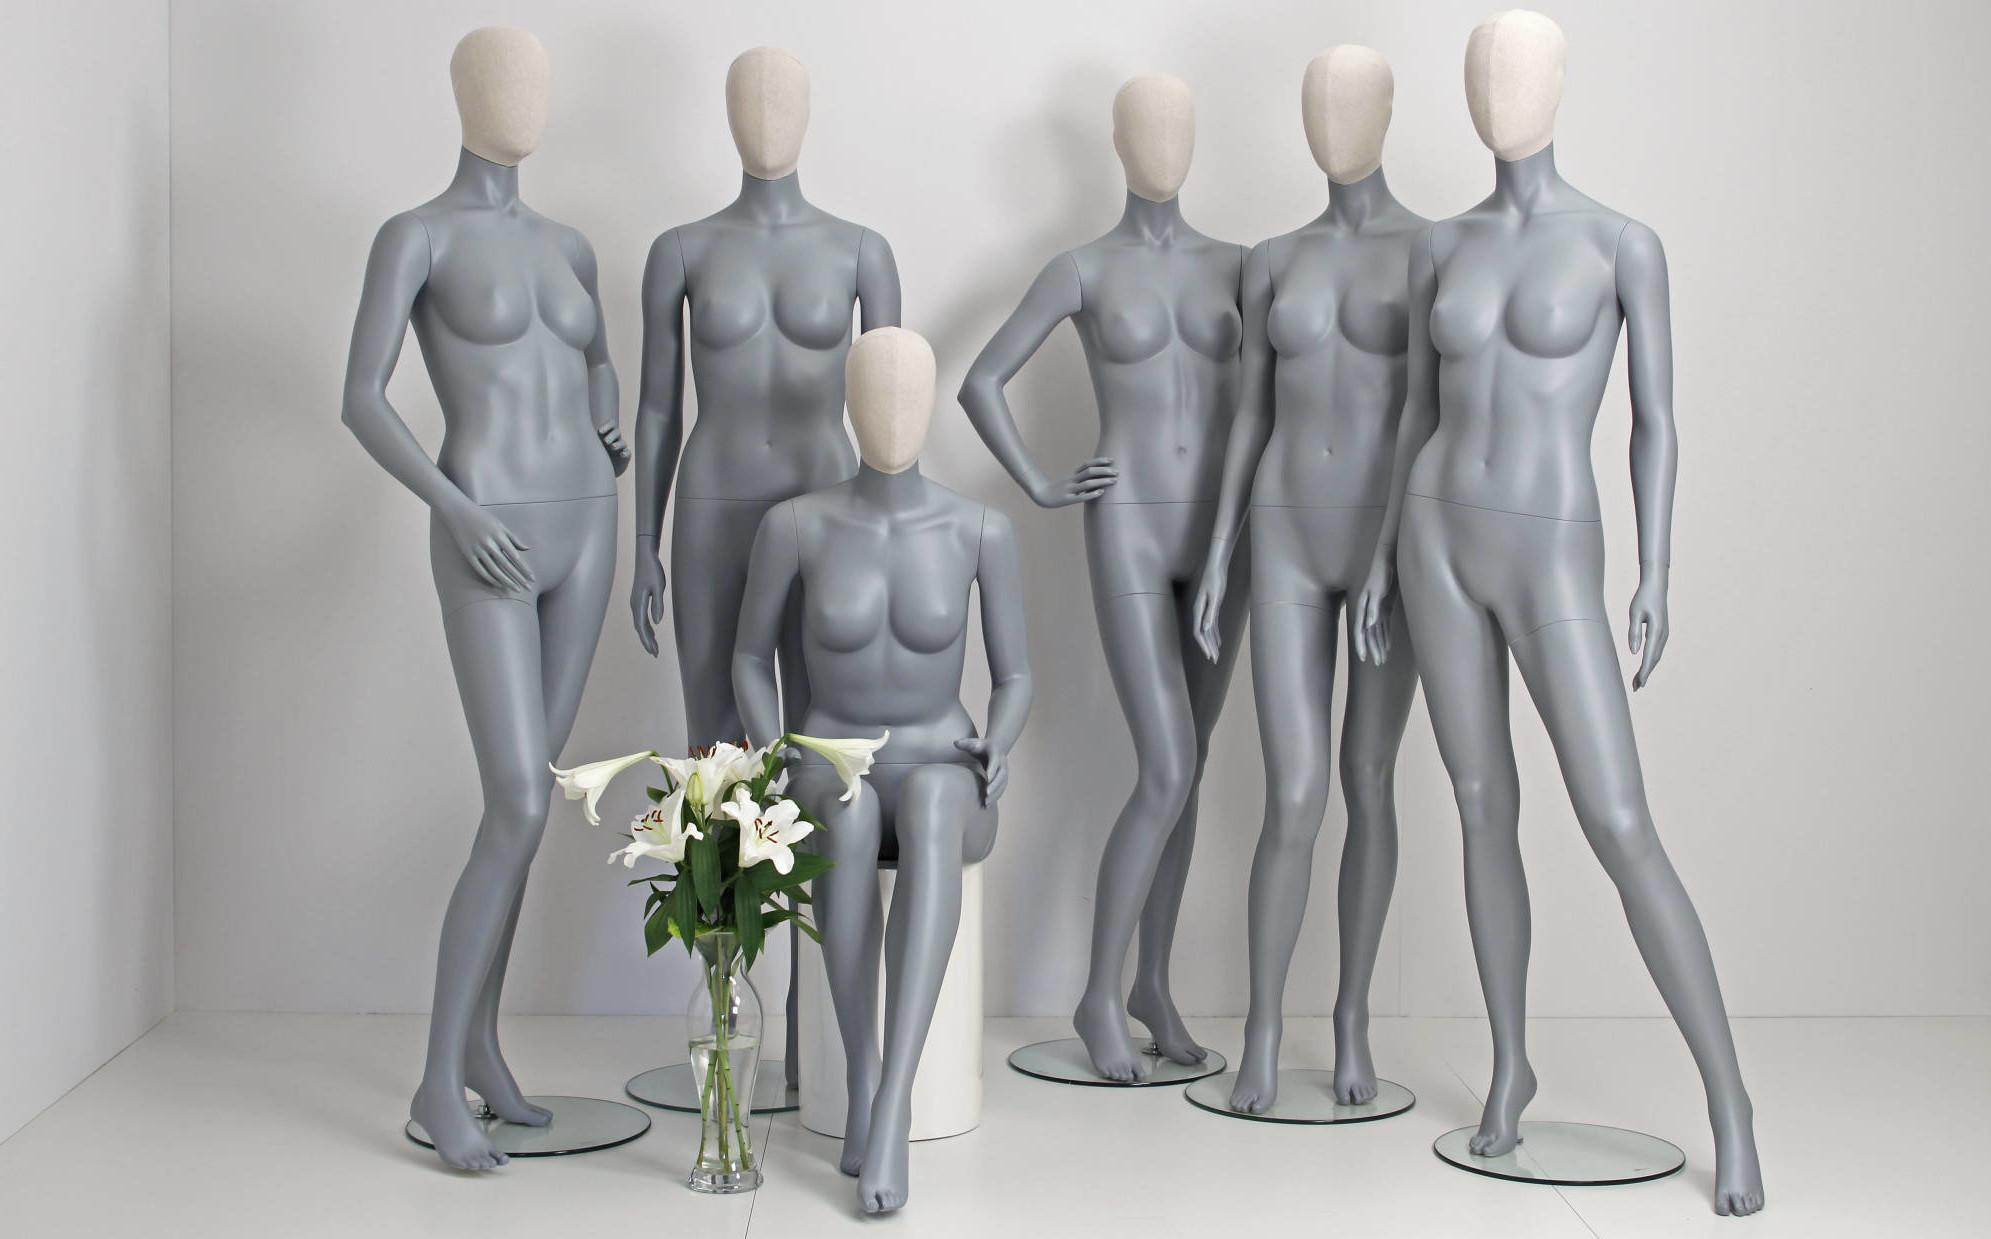 Mannequinen fås i flot grå farve, men kan leveres i andre ønskelige farver